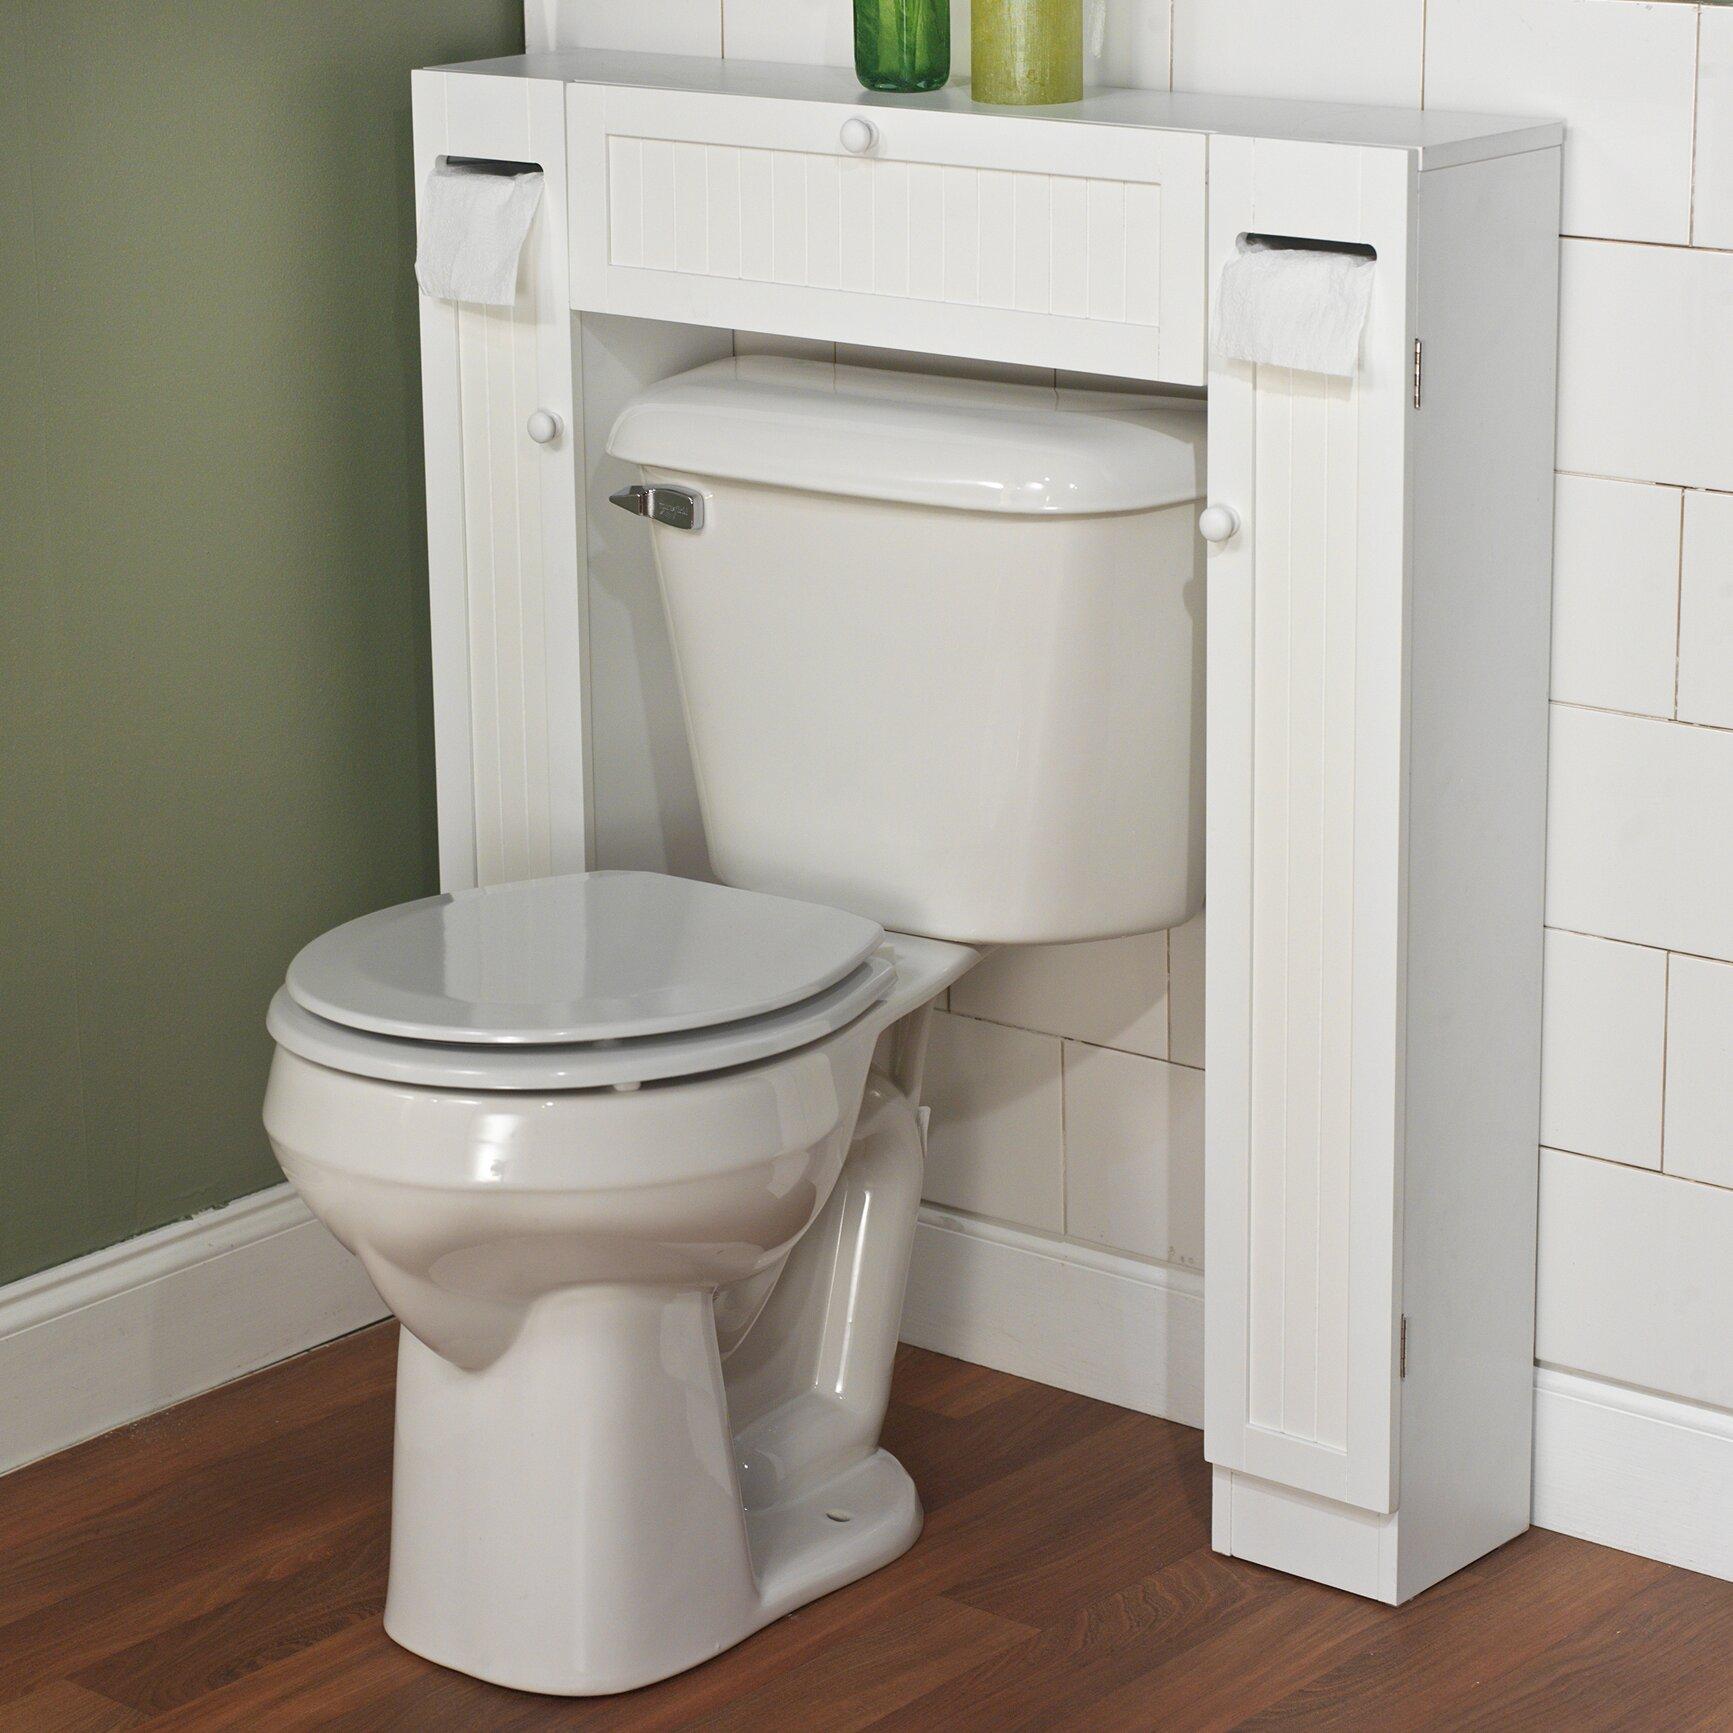 Bathroom Storage Cabi Over The Toilet E Saver